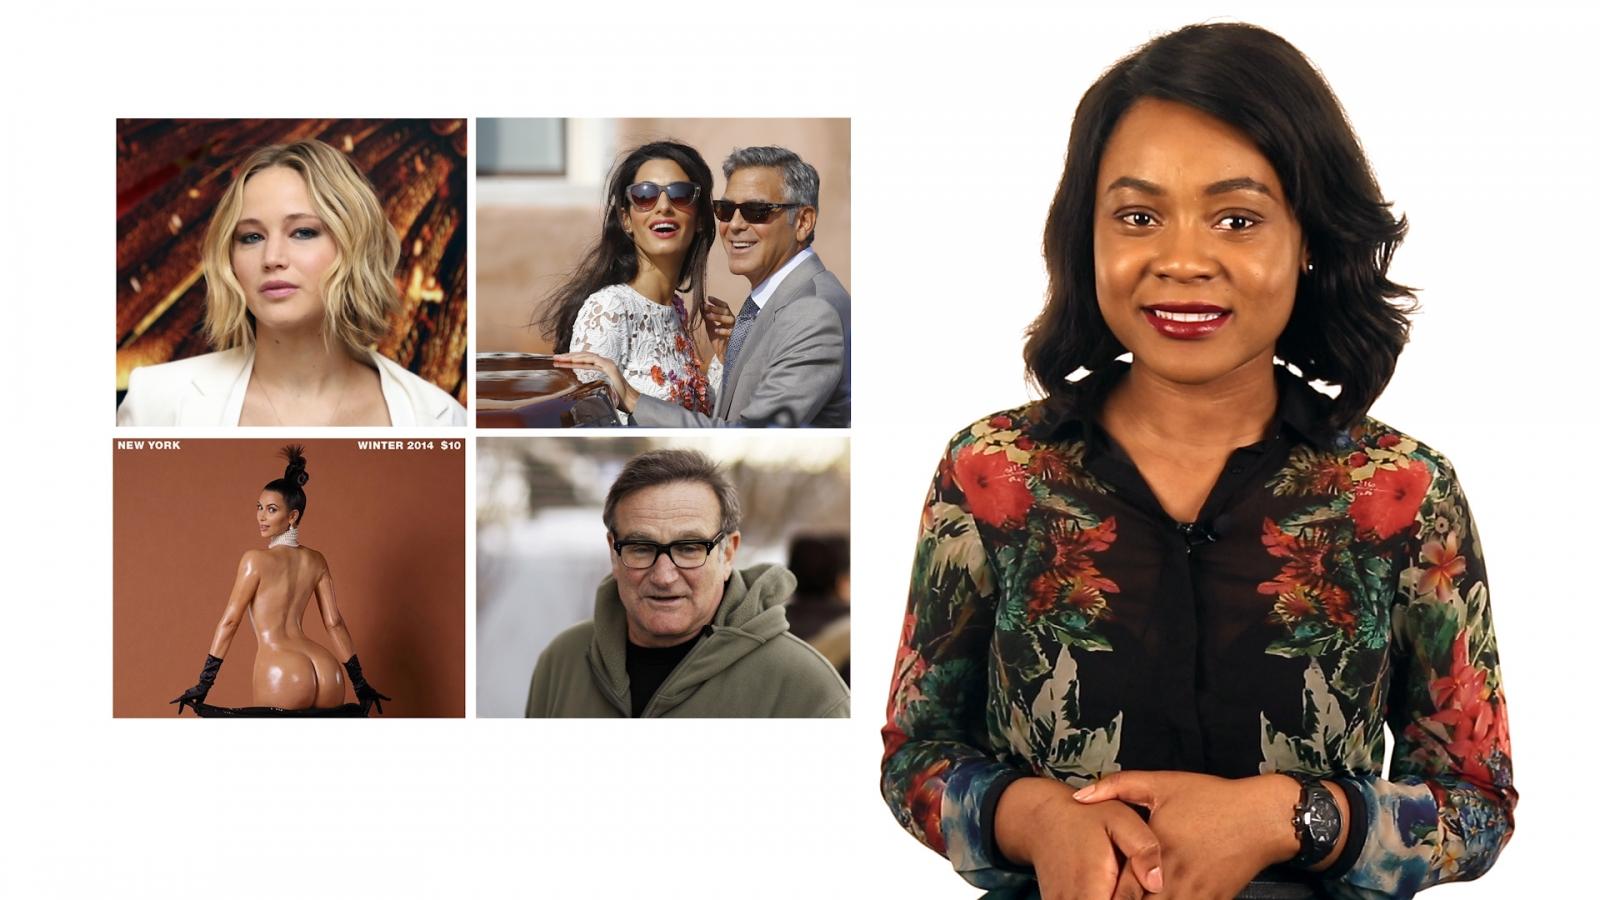 The biggest showbiz stories of 2014